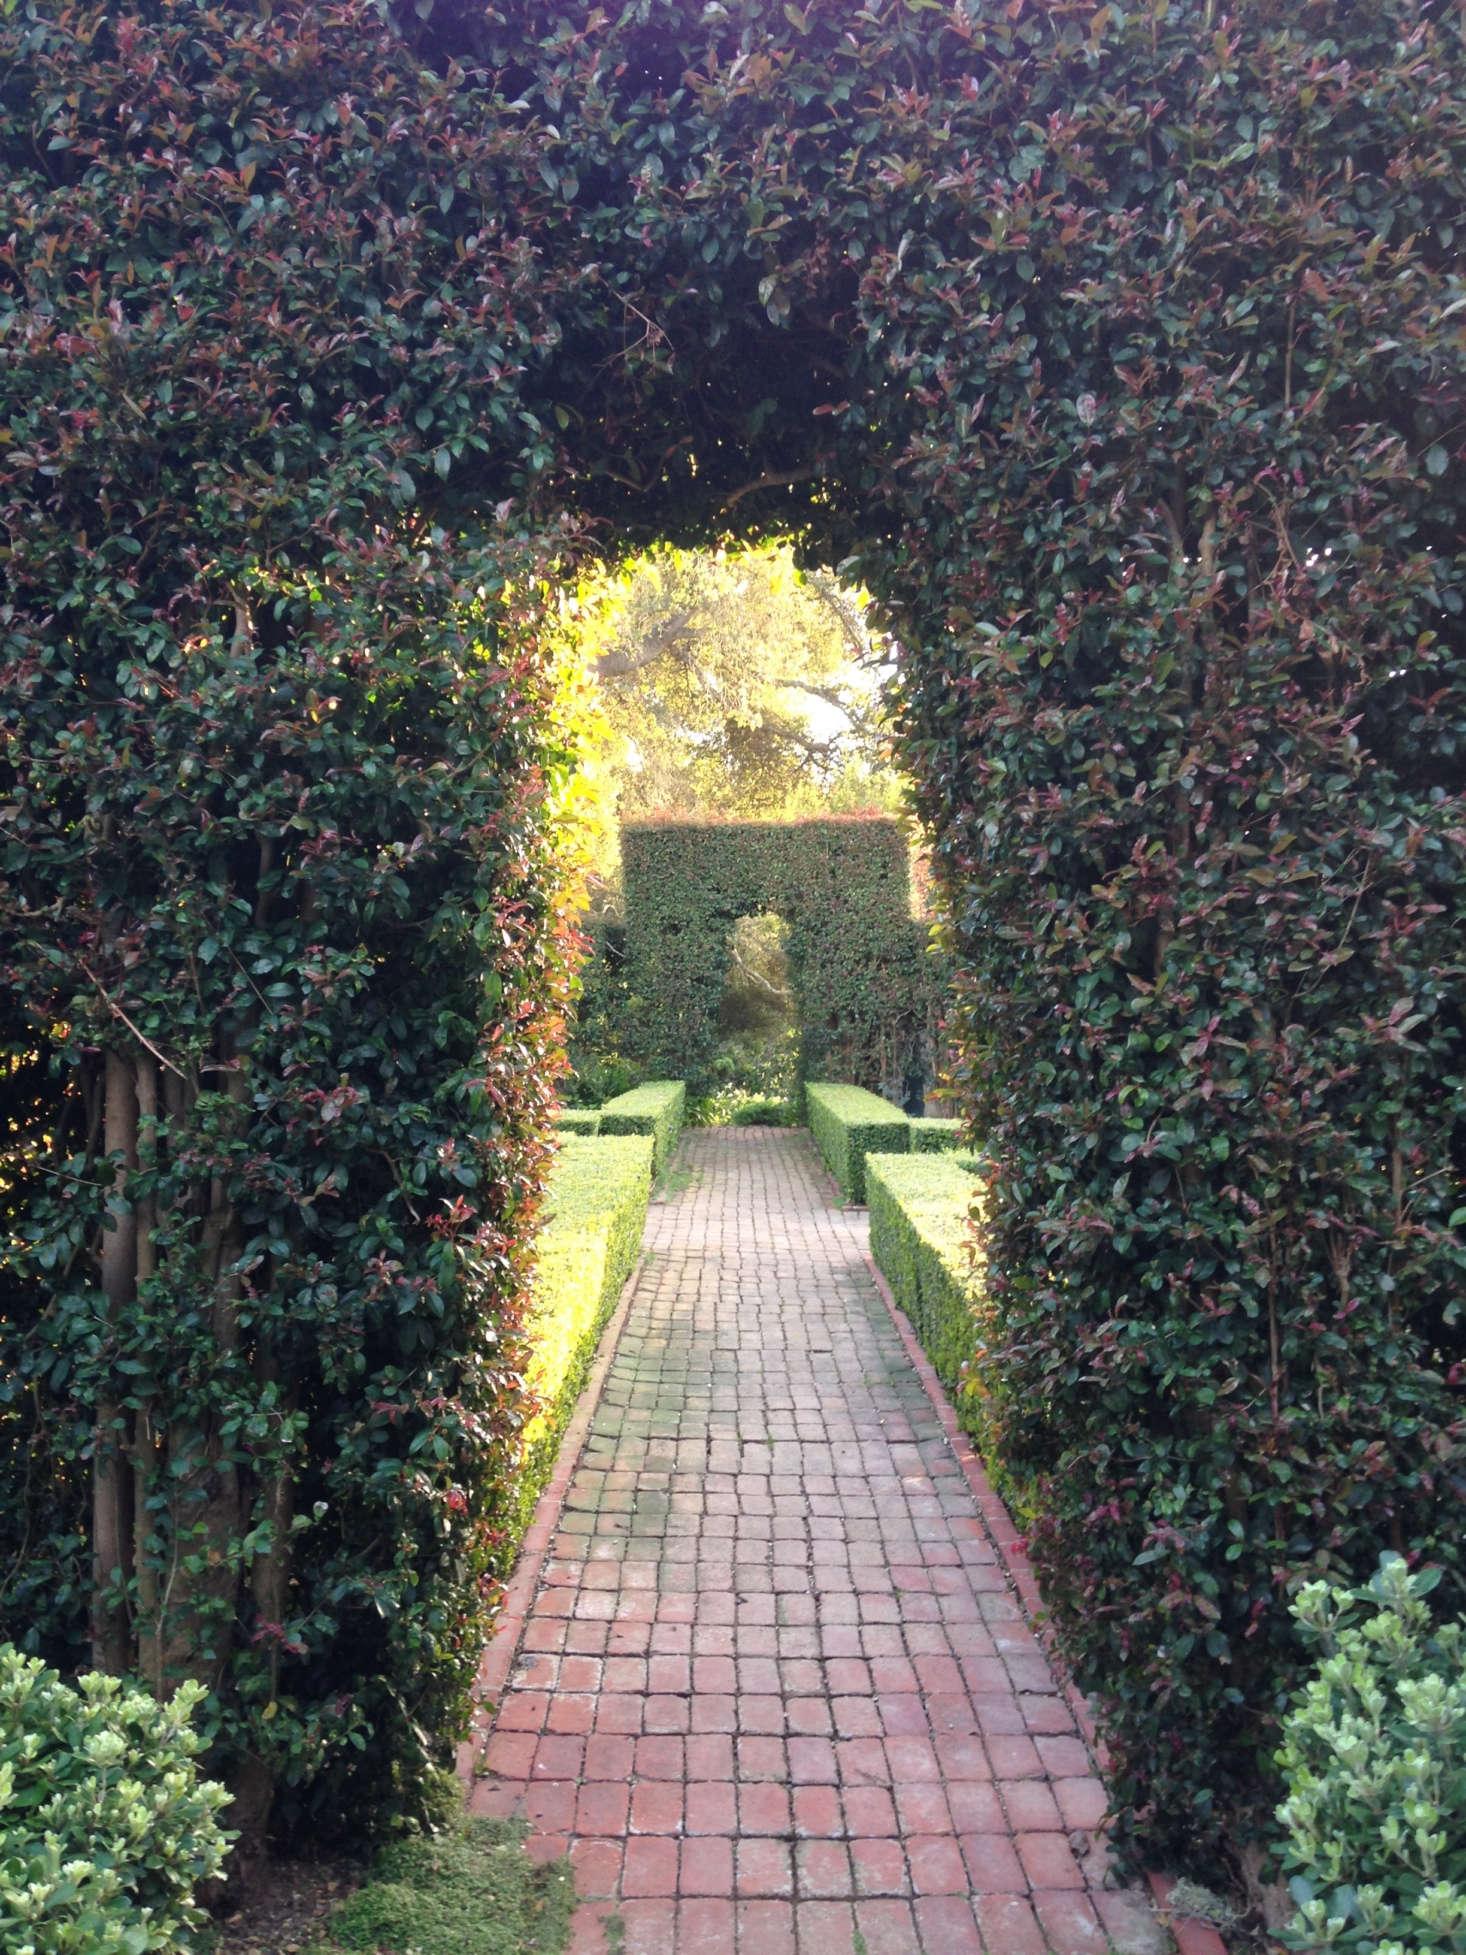 Deeper into the hedge maze. Photograph courtesy of Roberto Sosa.